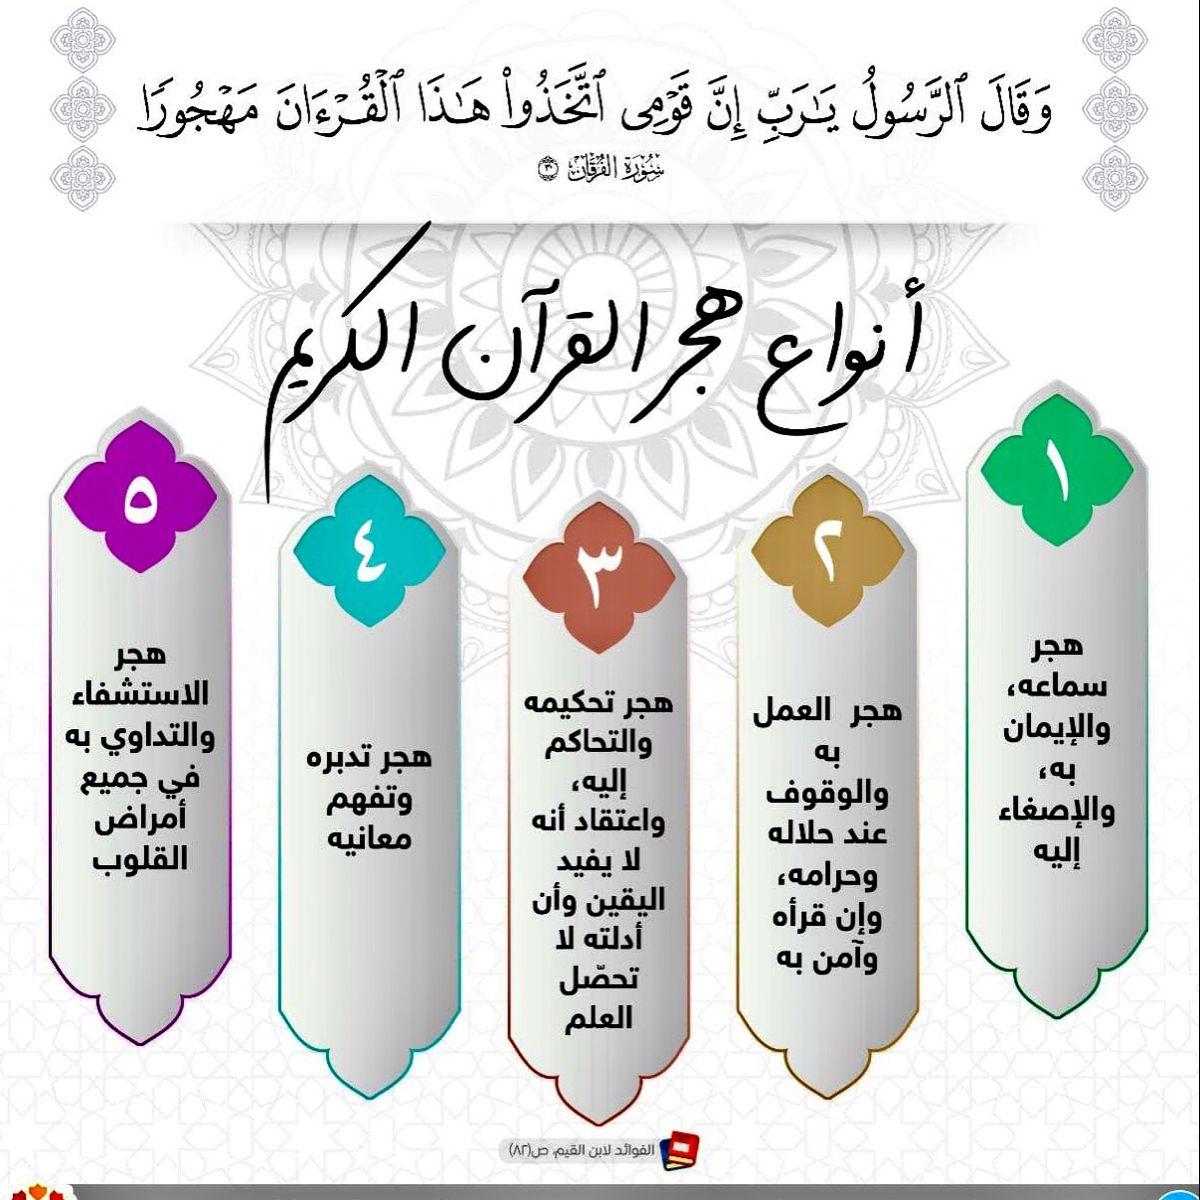 الفرقان ٣٠ و ق ال ٱلر س ول ی ـ ر ب إ ن ق و م ی ٱت خ ذ وا ه ـ ذ ا ٱل ق ر ء ان م ه ج ور ا In 2021 Islamic Inspirational Quotes Islam Facts Islamic Phrases